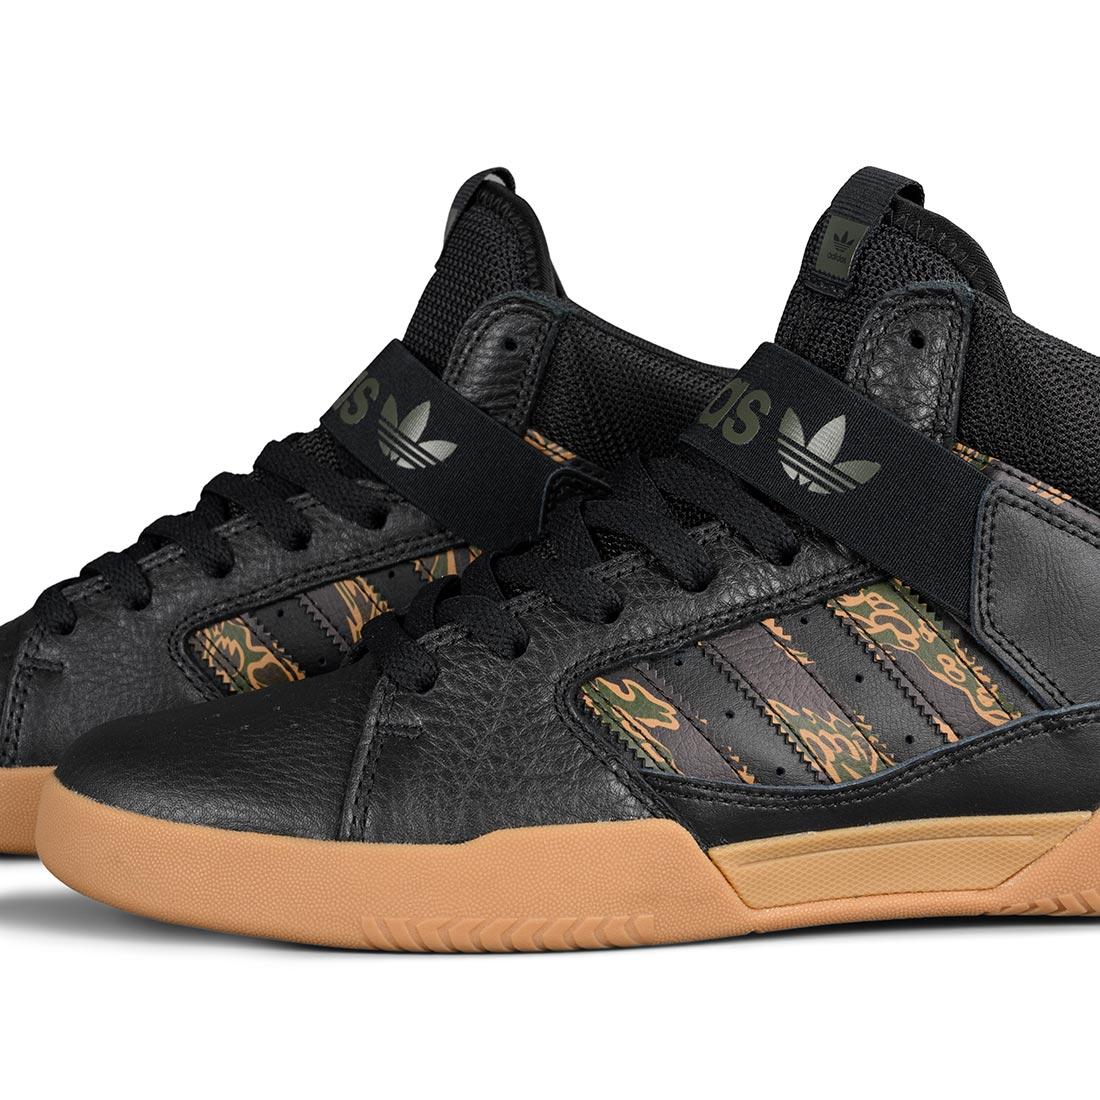 Adidas VRX Mid Shoes - Core Black